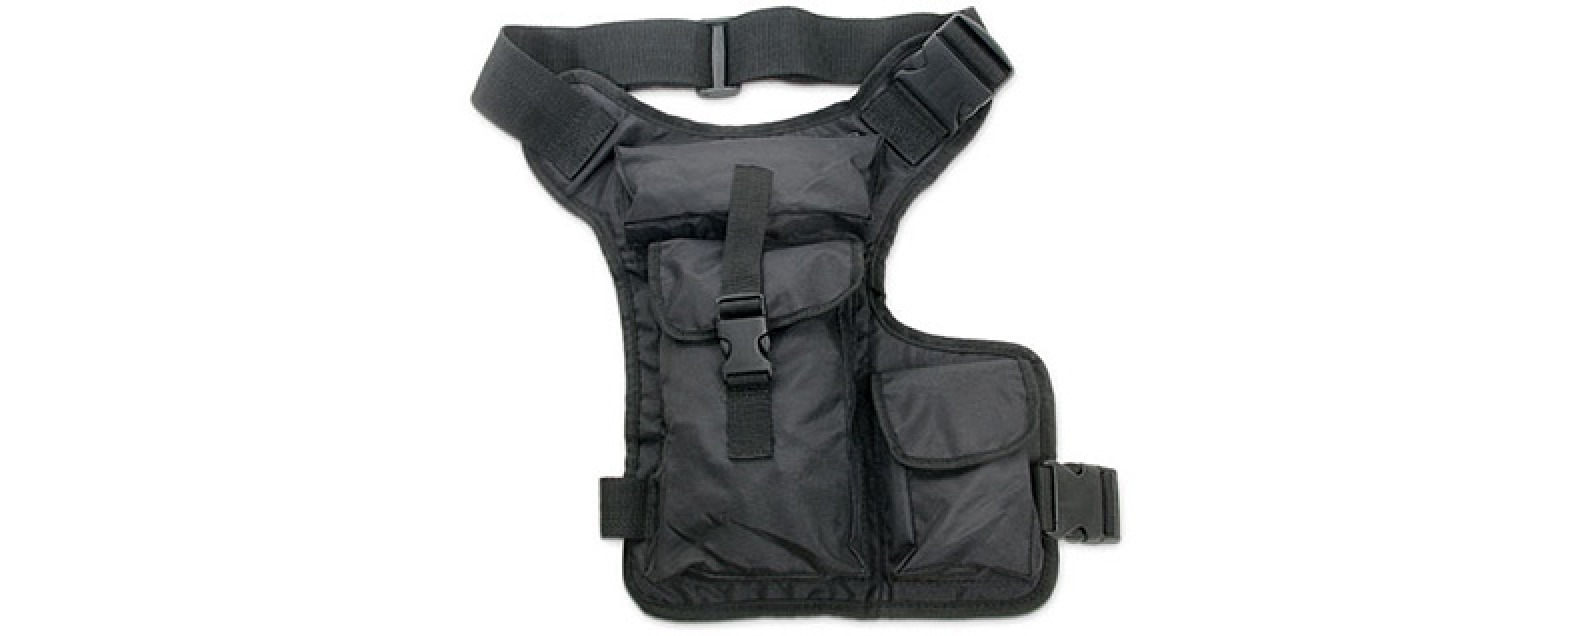 Best iPad Travel Bag: Grab-It Pack Gadget Holster Review